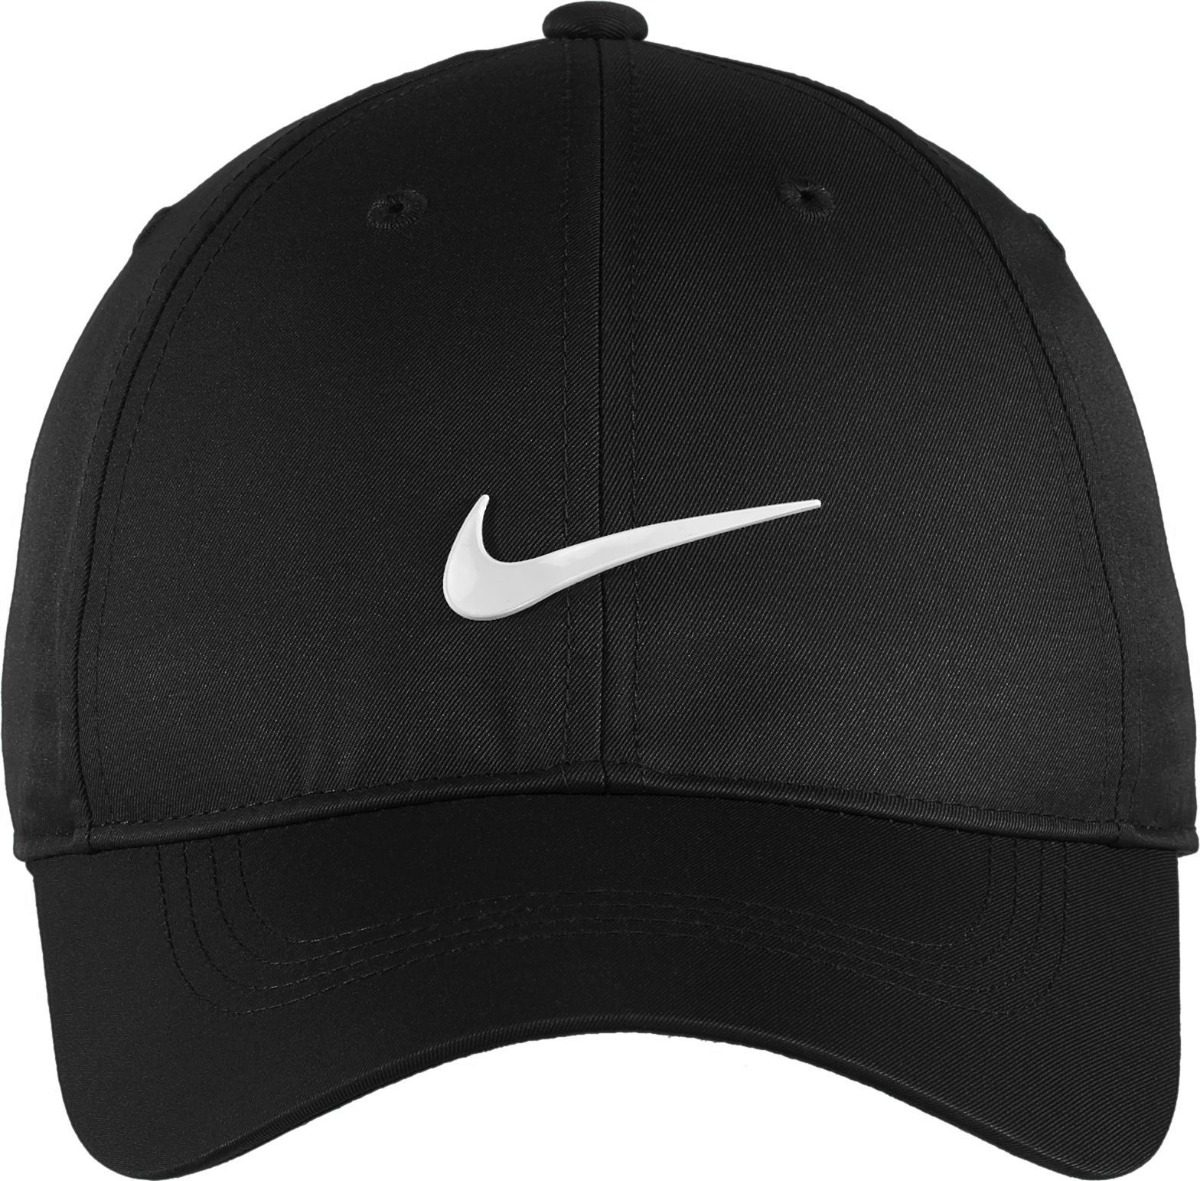 gorra nike drifit originales ideal running-tenis-golf. Cargando zoom. 4f32c9e36f2